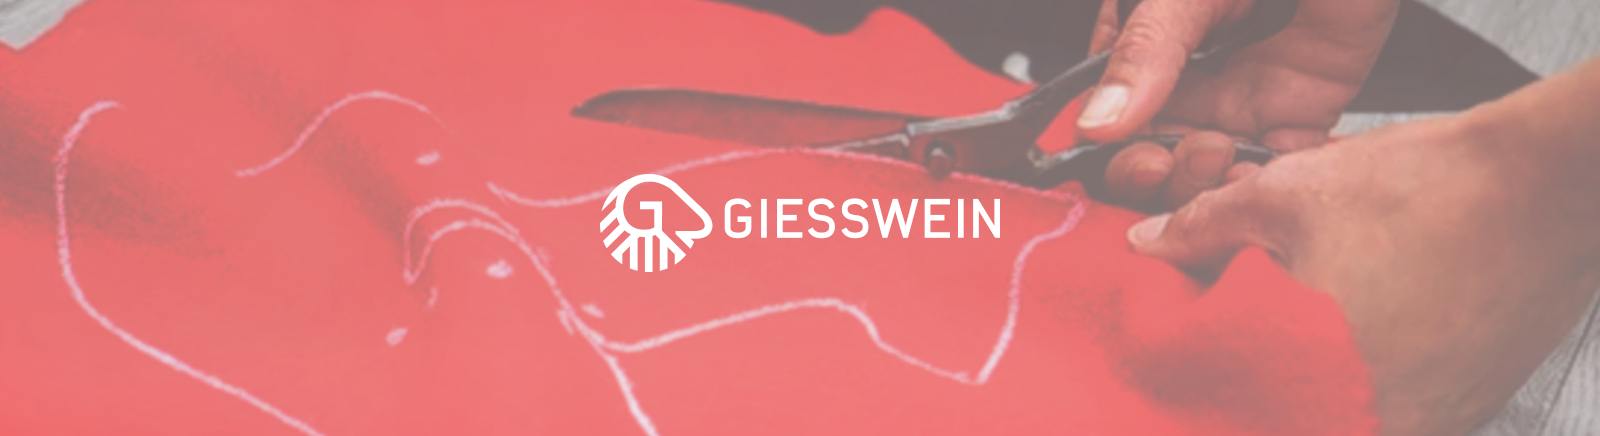 Juppen: Giesswein Bequeme Hausschuhe für Herren online shoppen